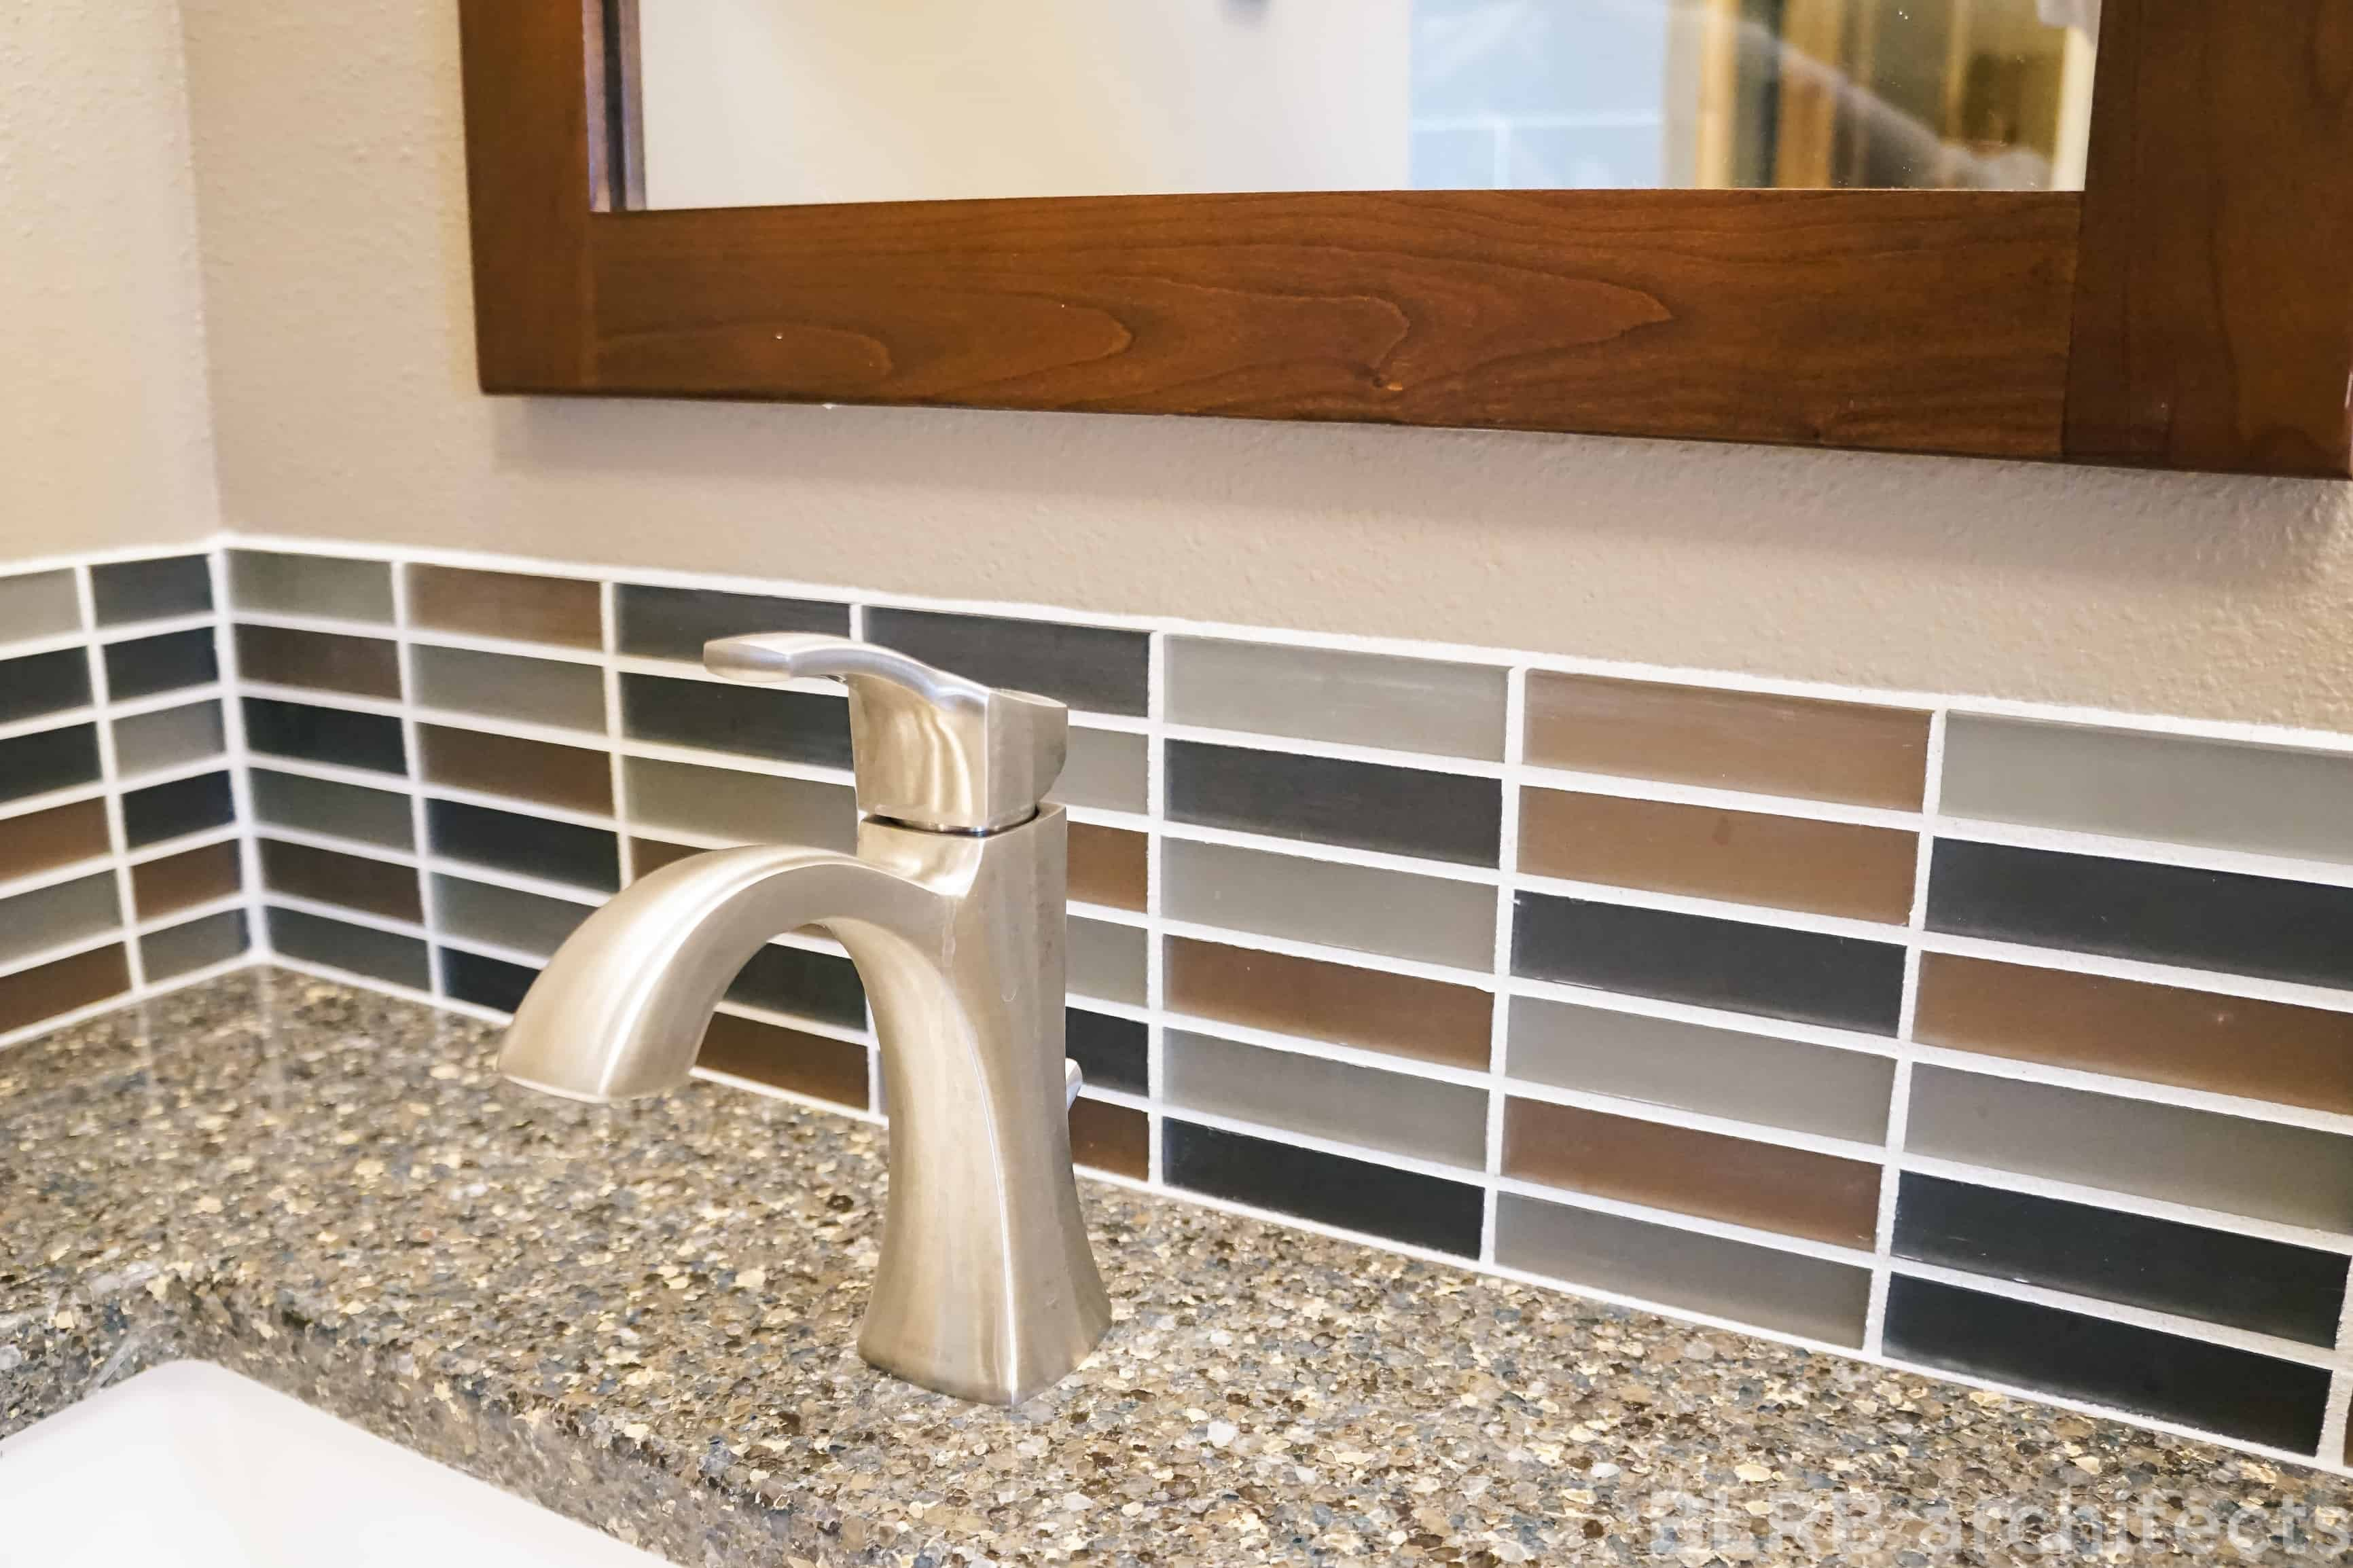 tile backsplash ascent architecture interiors bend